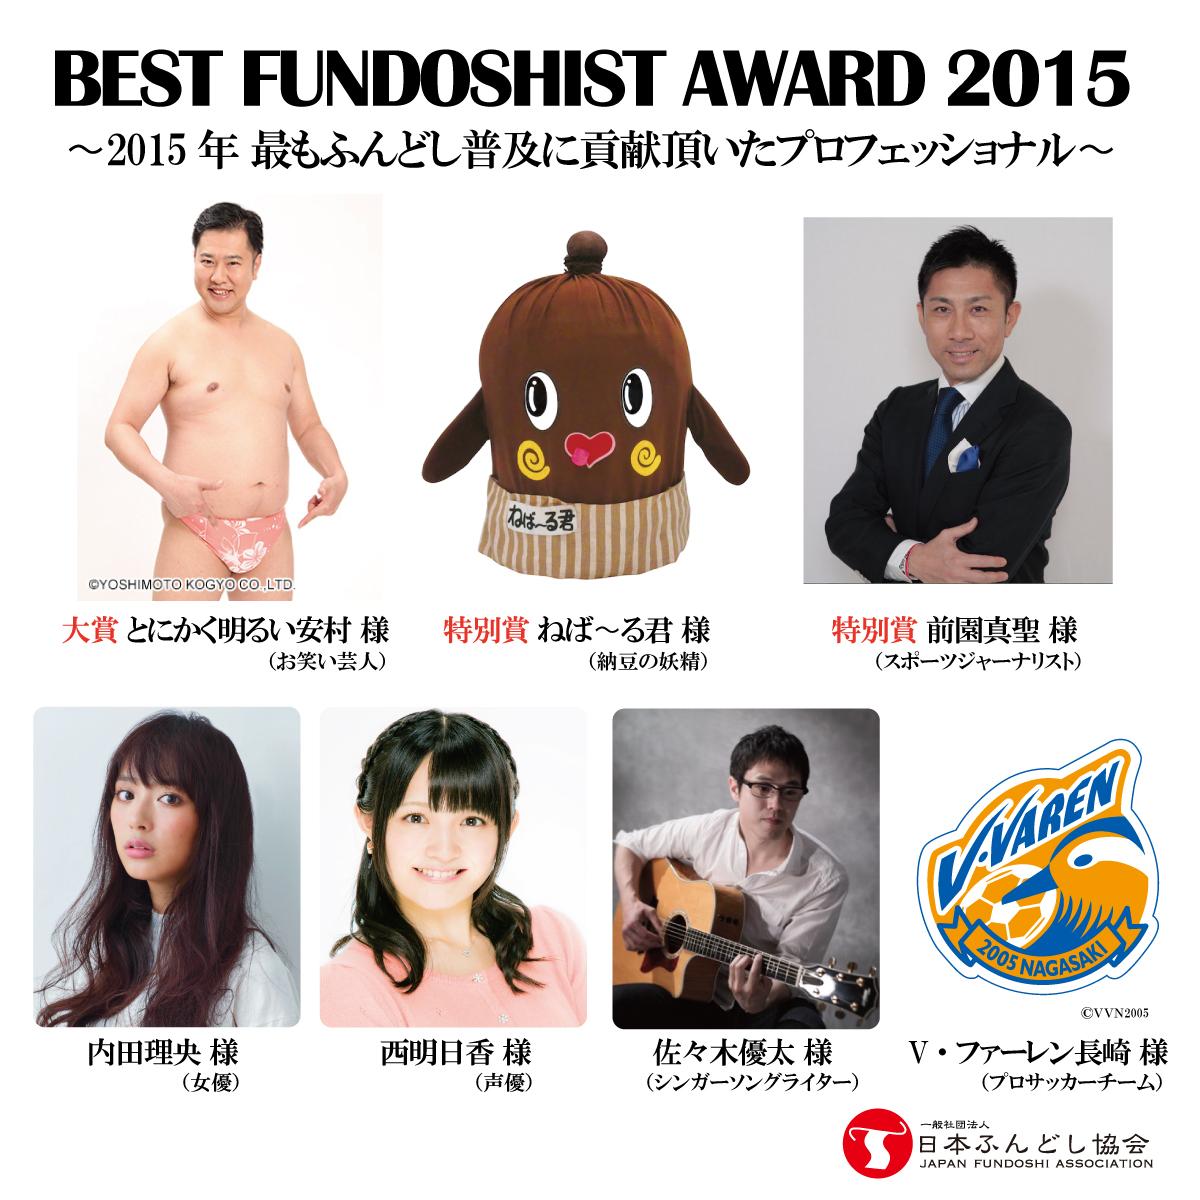 FUNDOSHIST2015